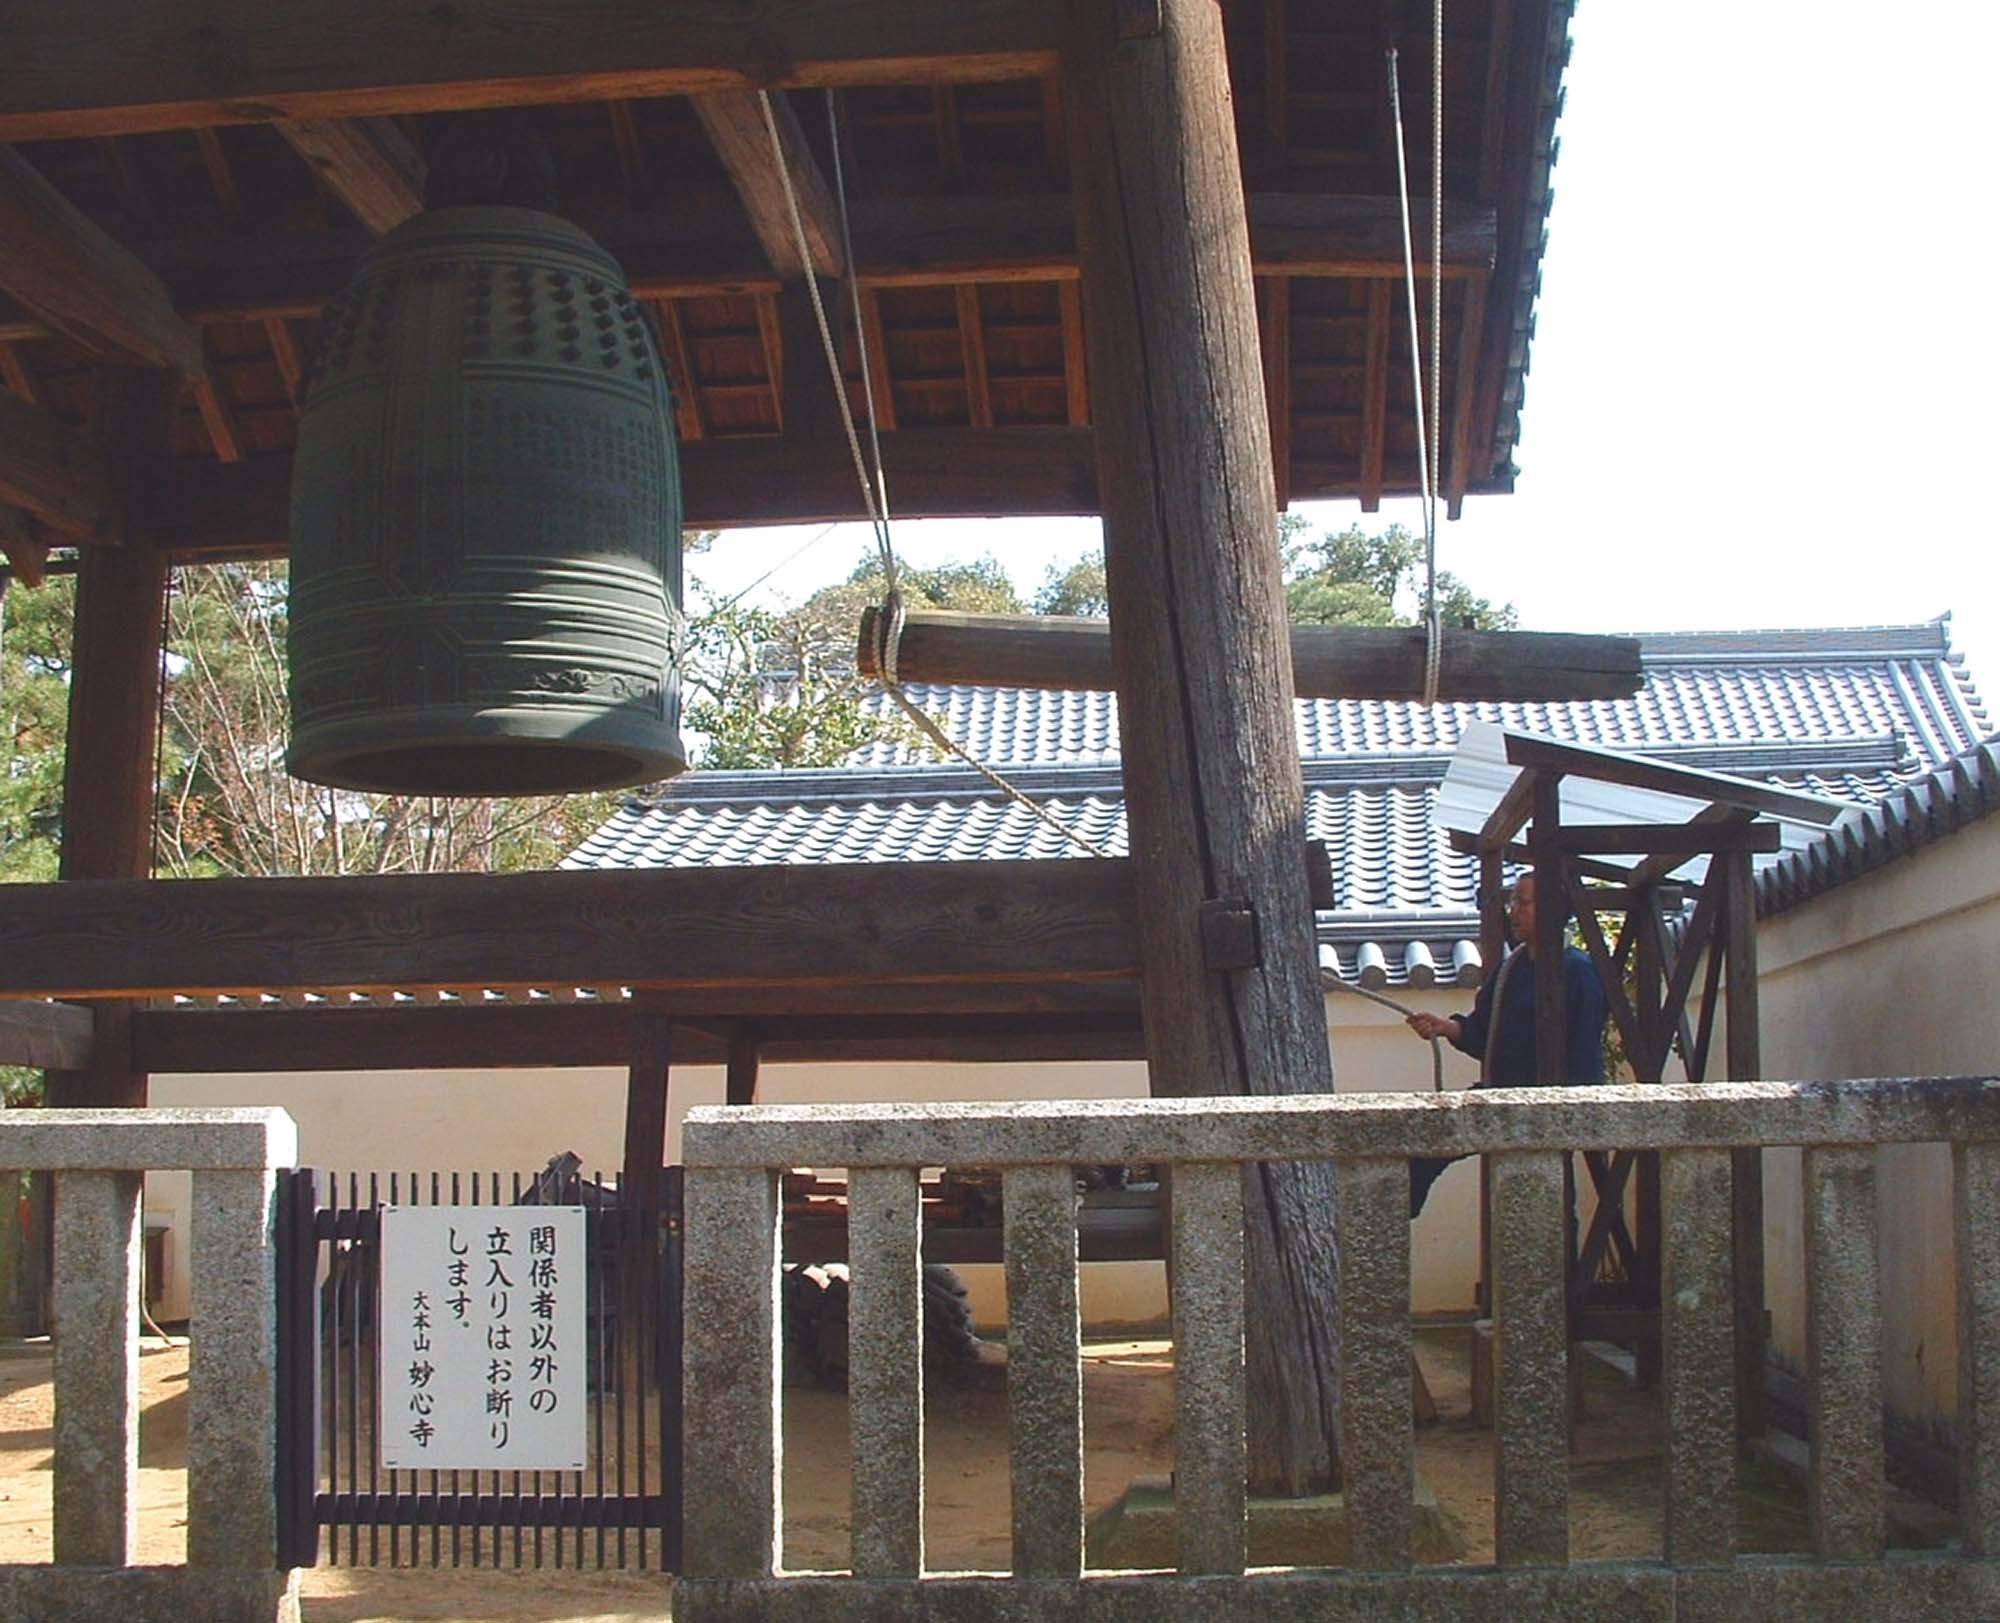 Bell in the Myoshin-ji temple complex, Kyoto, Japan